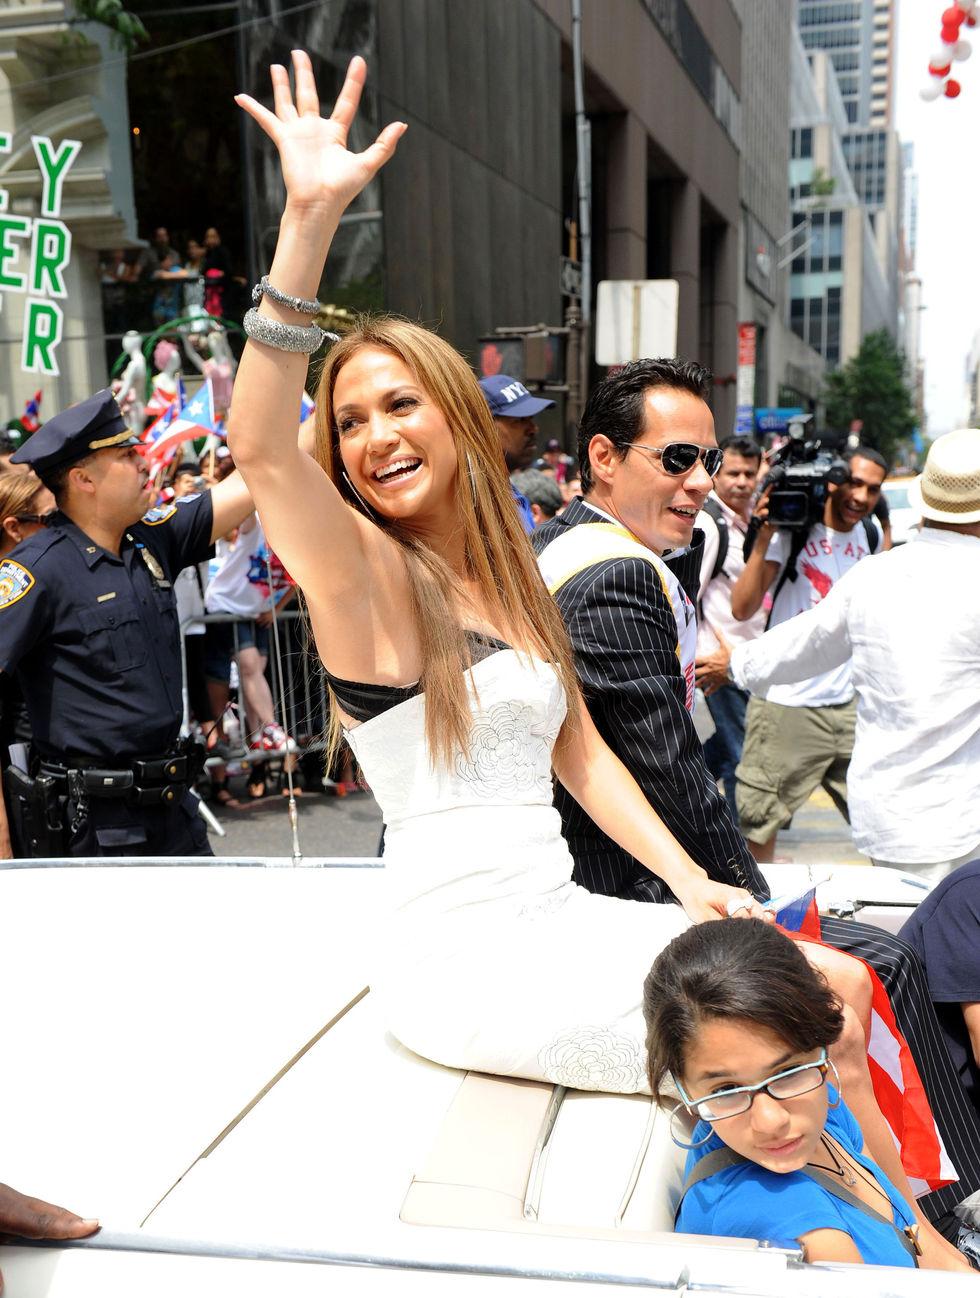 Jennifer Lopez 2010 : jennifer-lopez-at-puerto-rican-day-parade-jun-2010-11